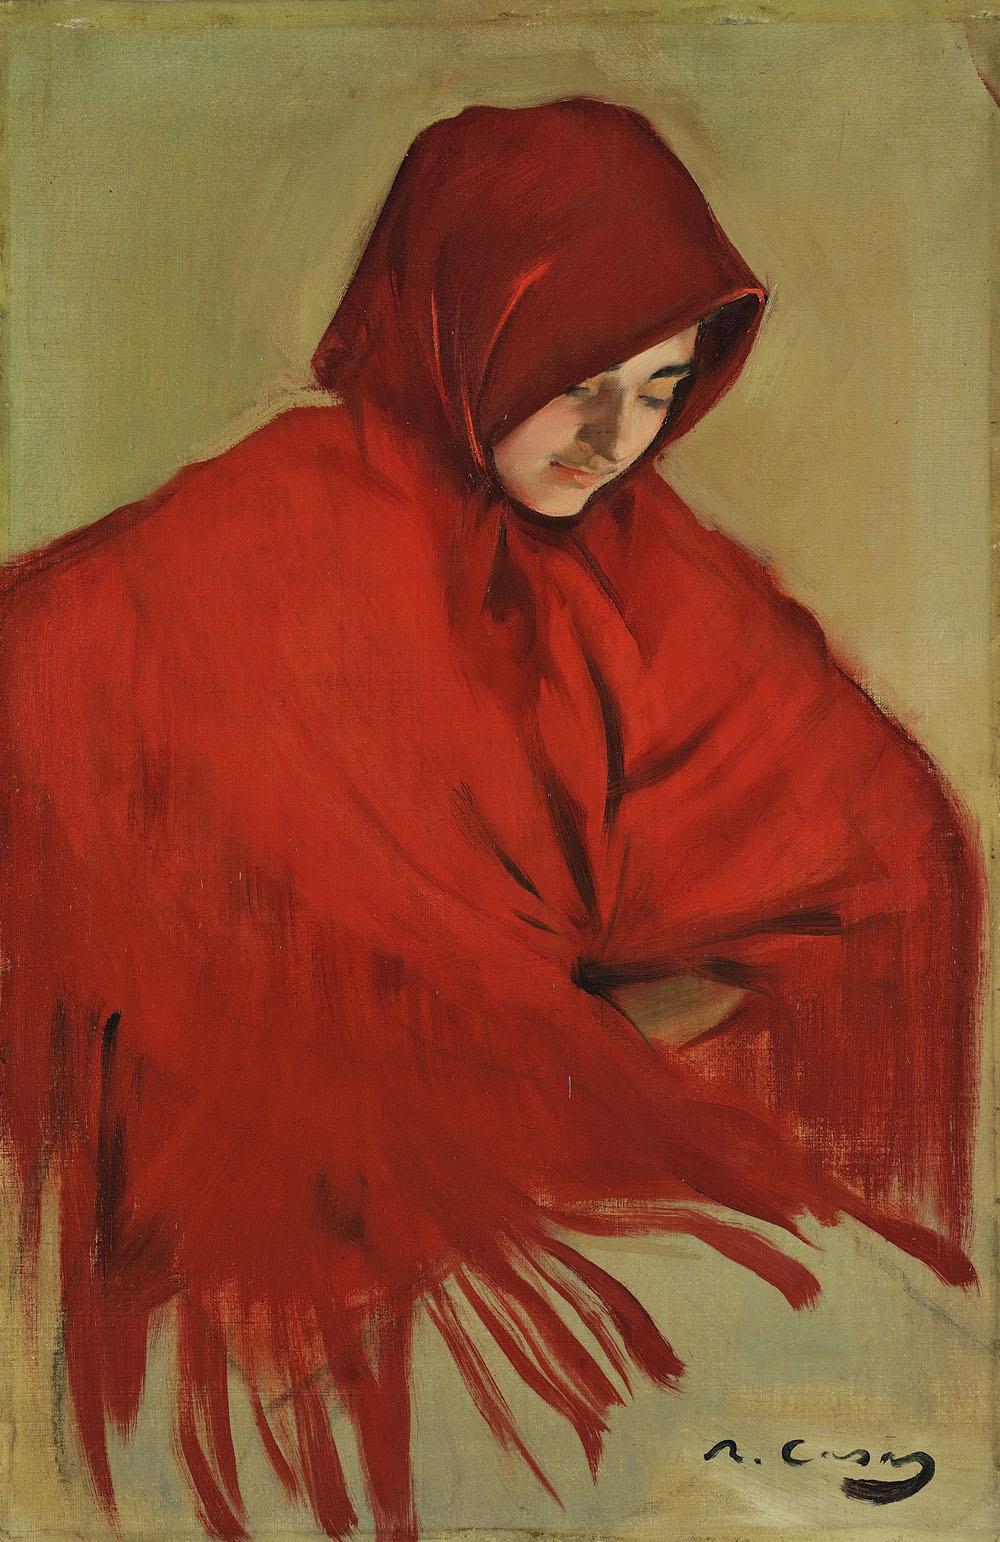 Ramon Casas i Carbó. Gypsy with a red shawl